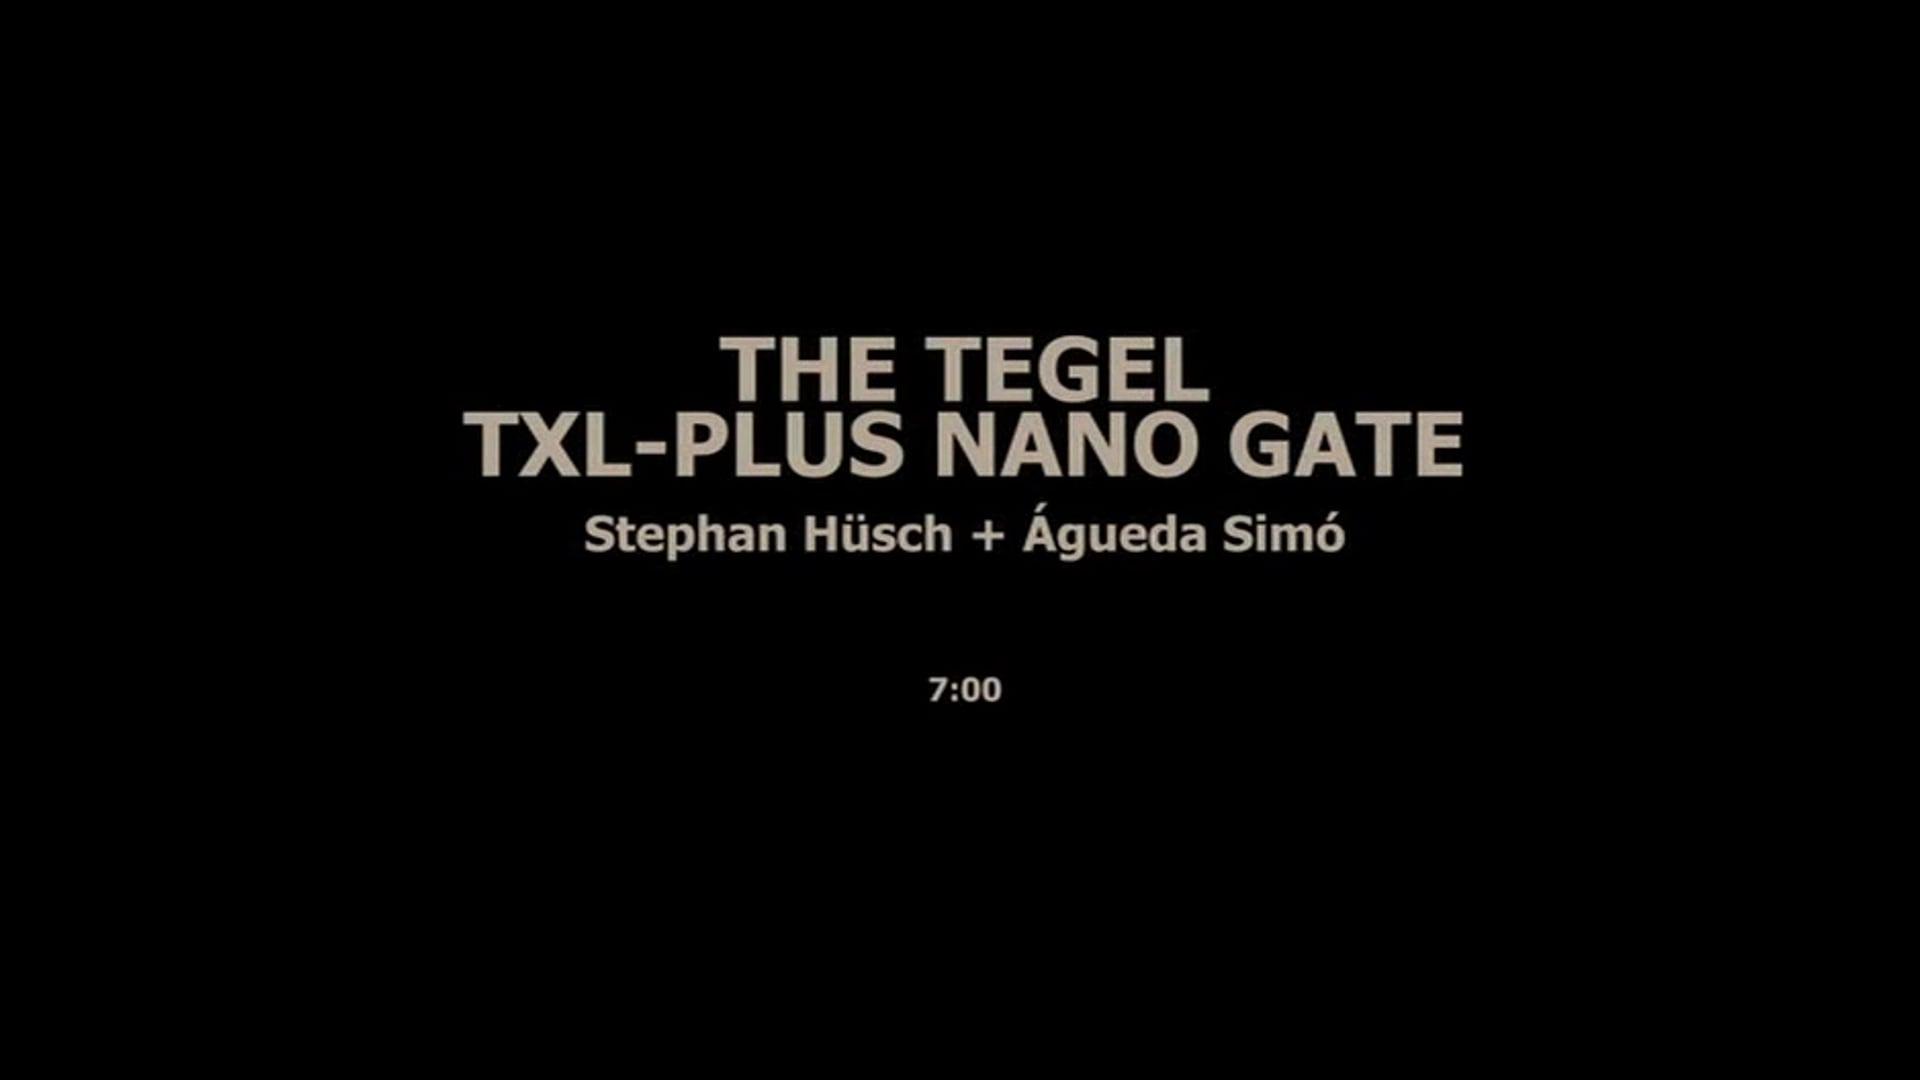 THE TEGEL TXL-PLUS NANO GATE - Águeda Simó Stephen Hüsch